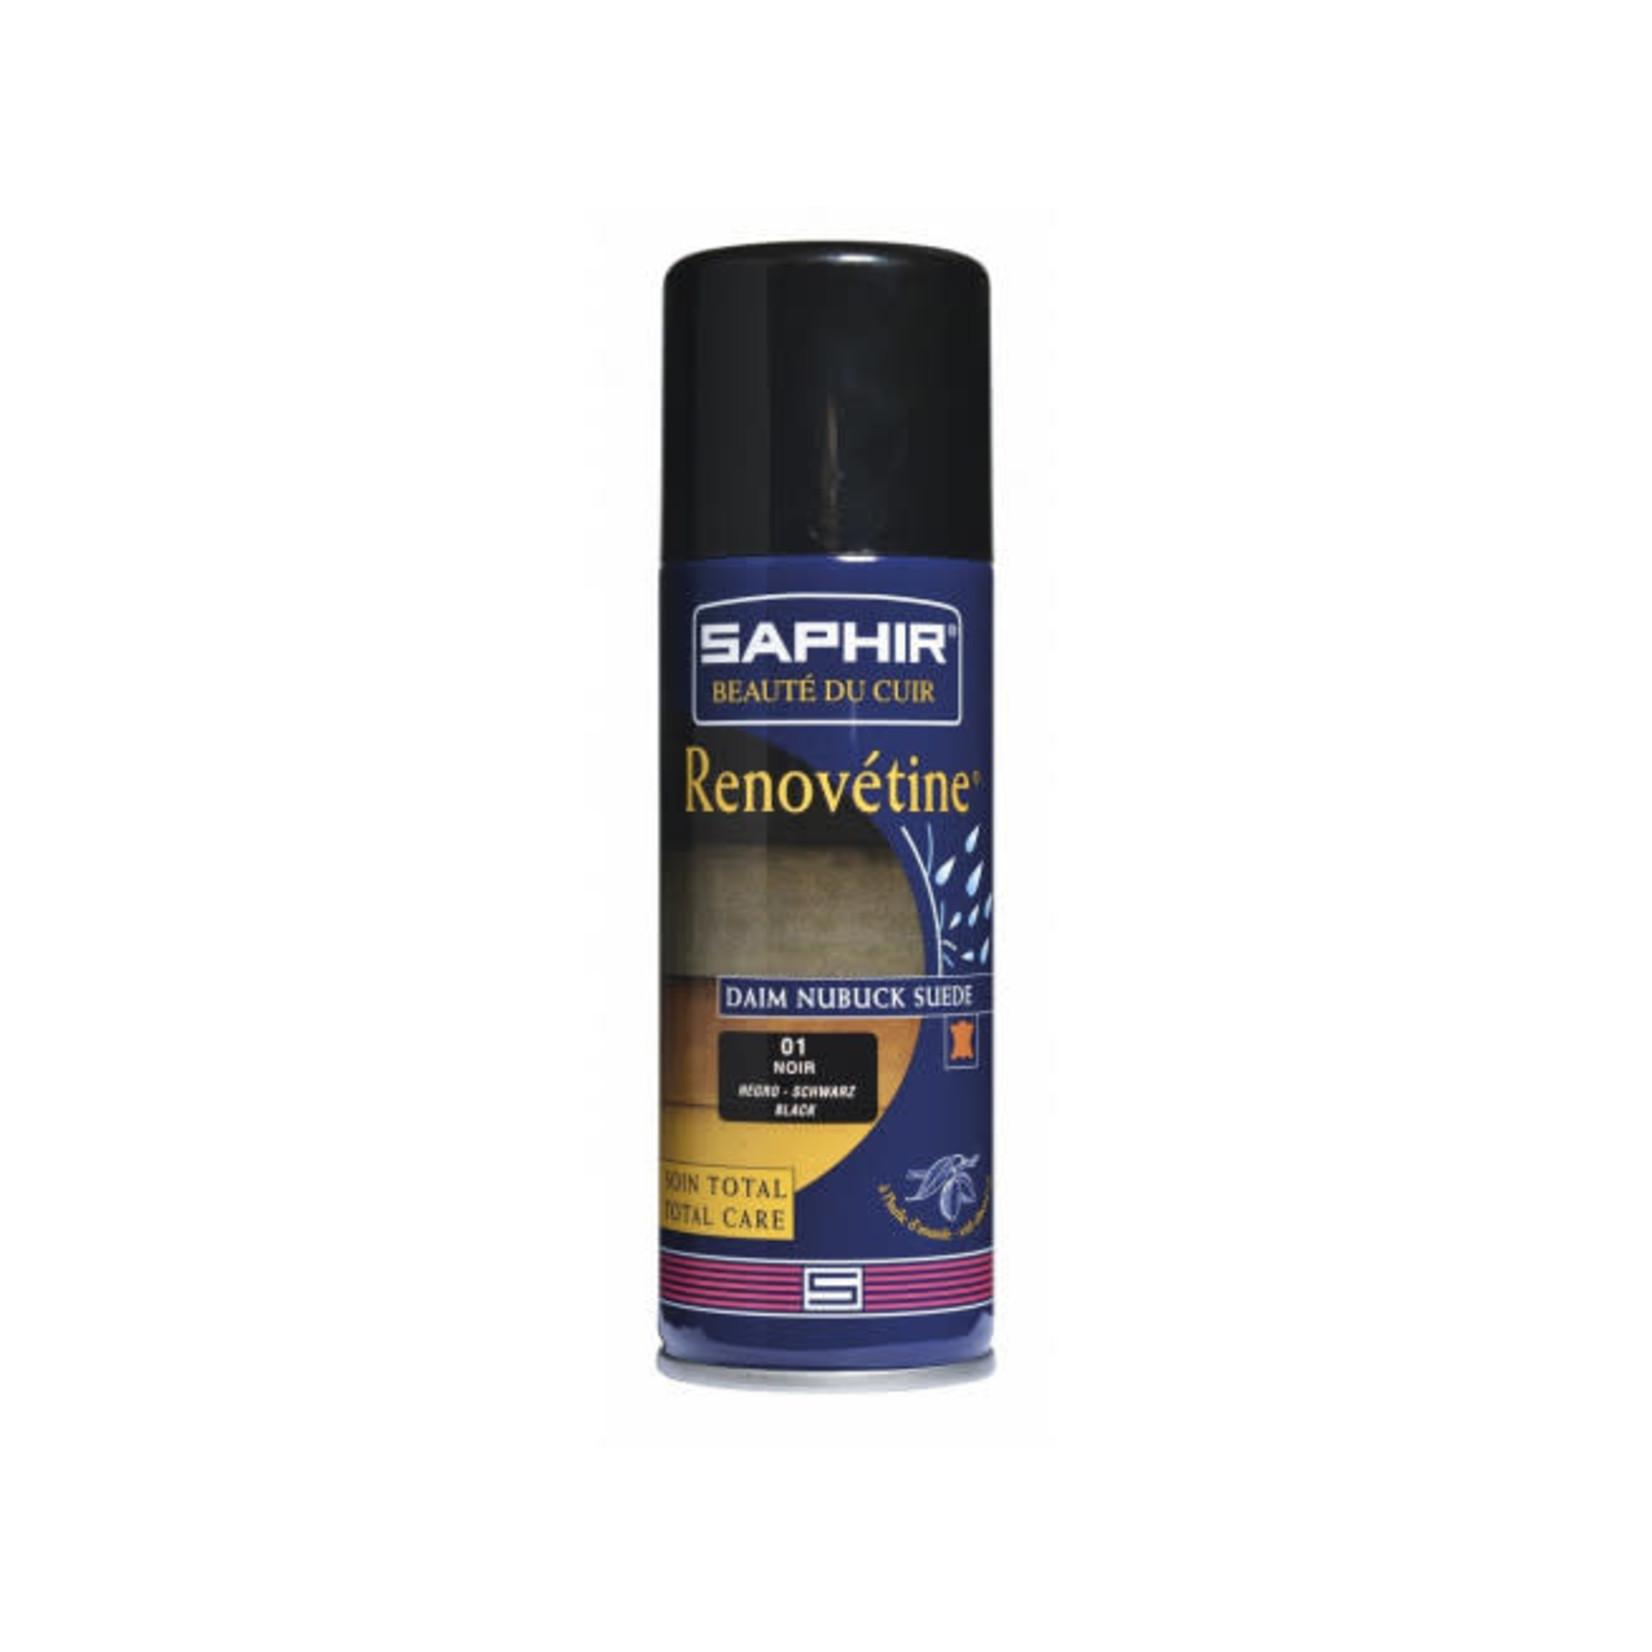 SAPHIR Saphir - Renovétine noir pour daim